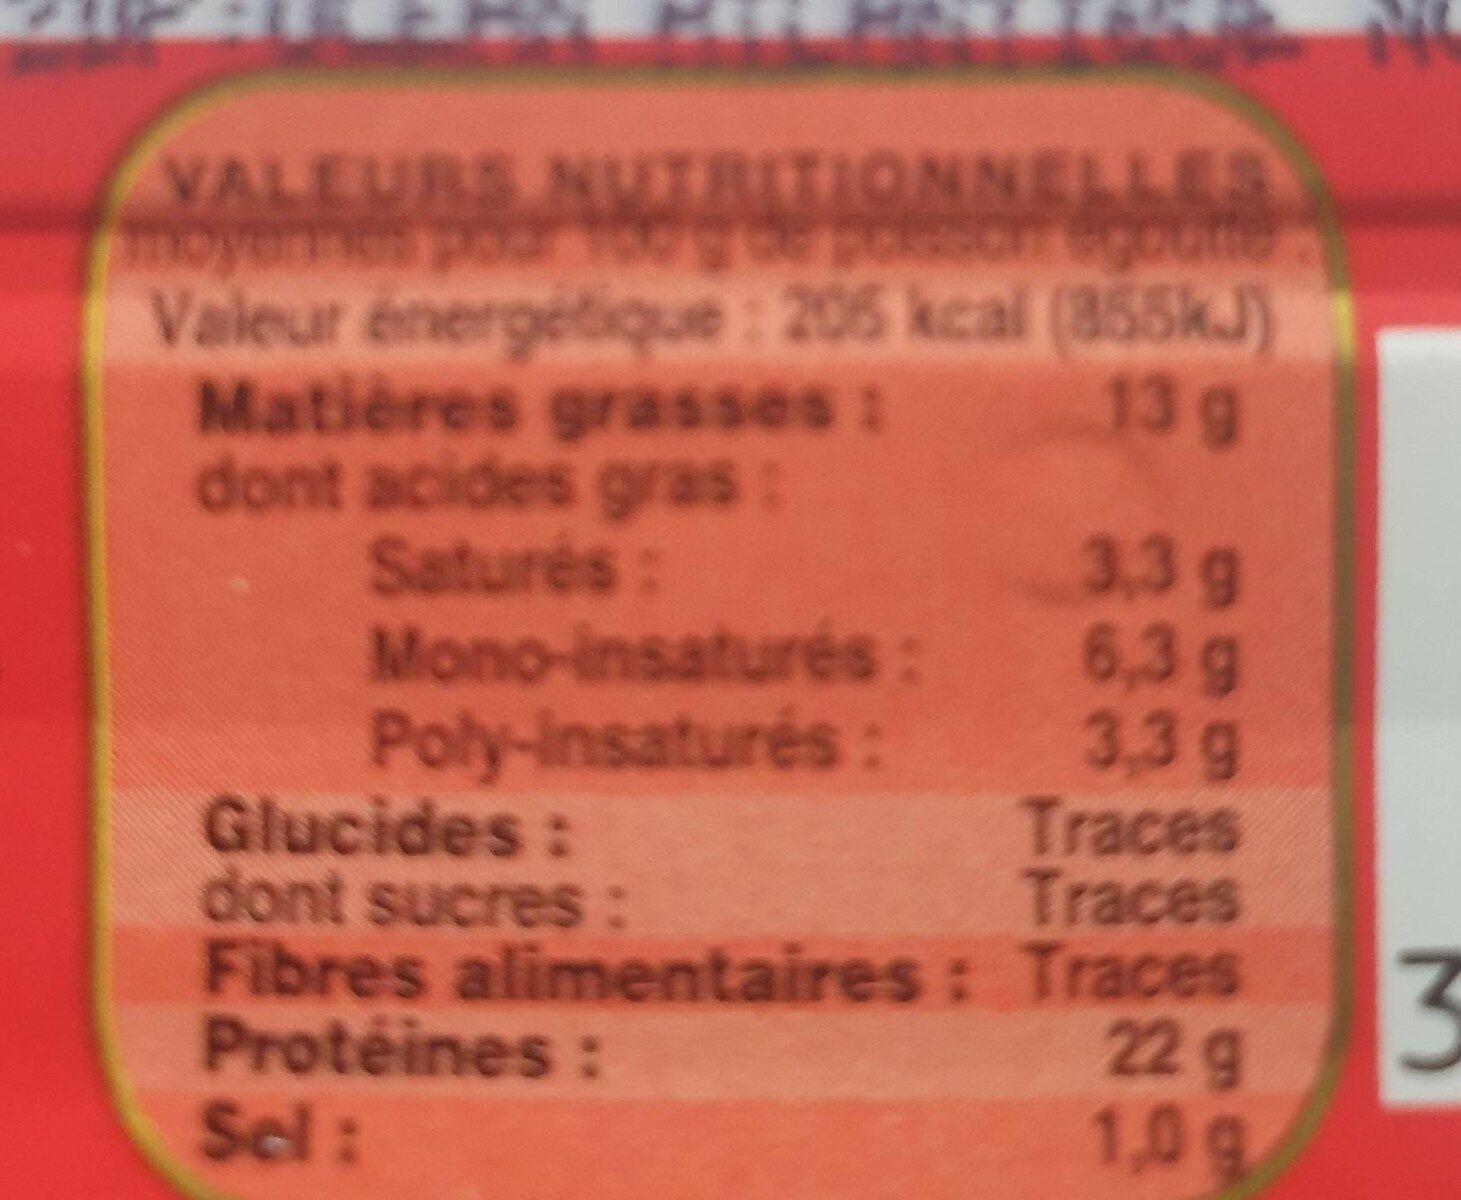 Filets de sardines label rouge - Valori nutrizionali - fr